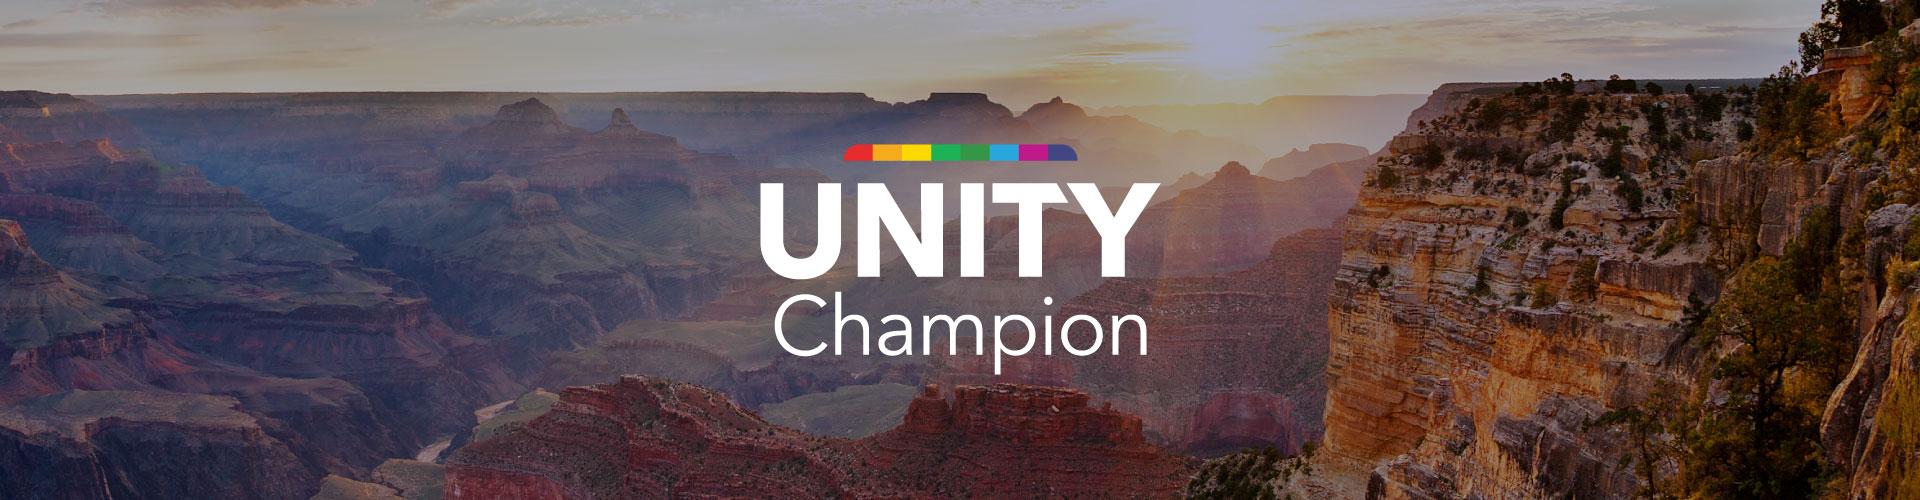 UNITY Champion